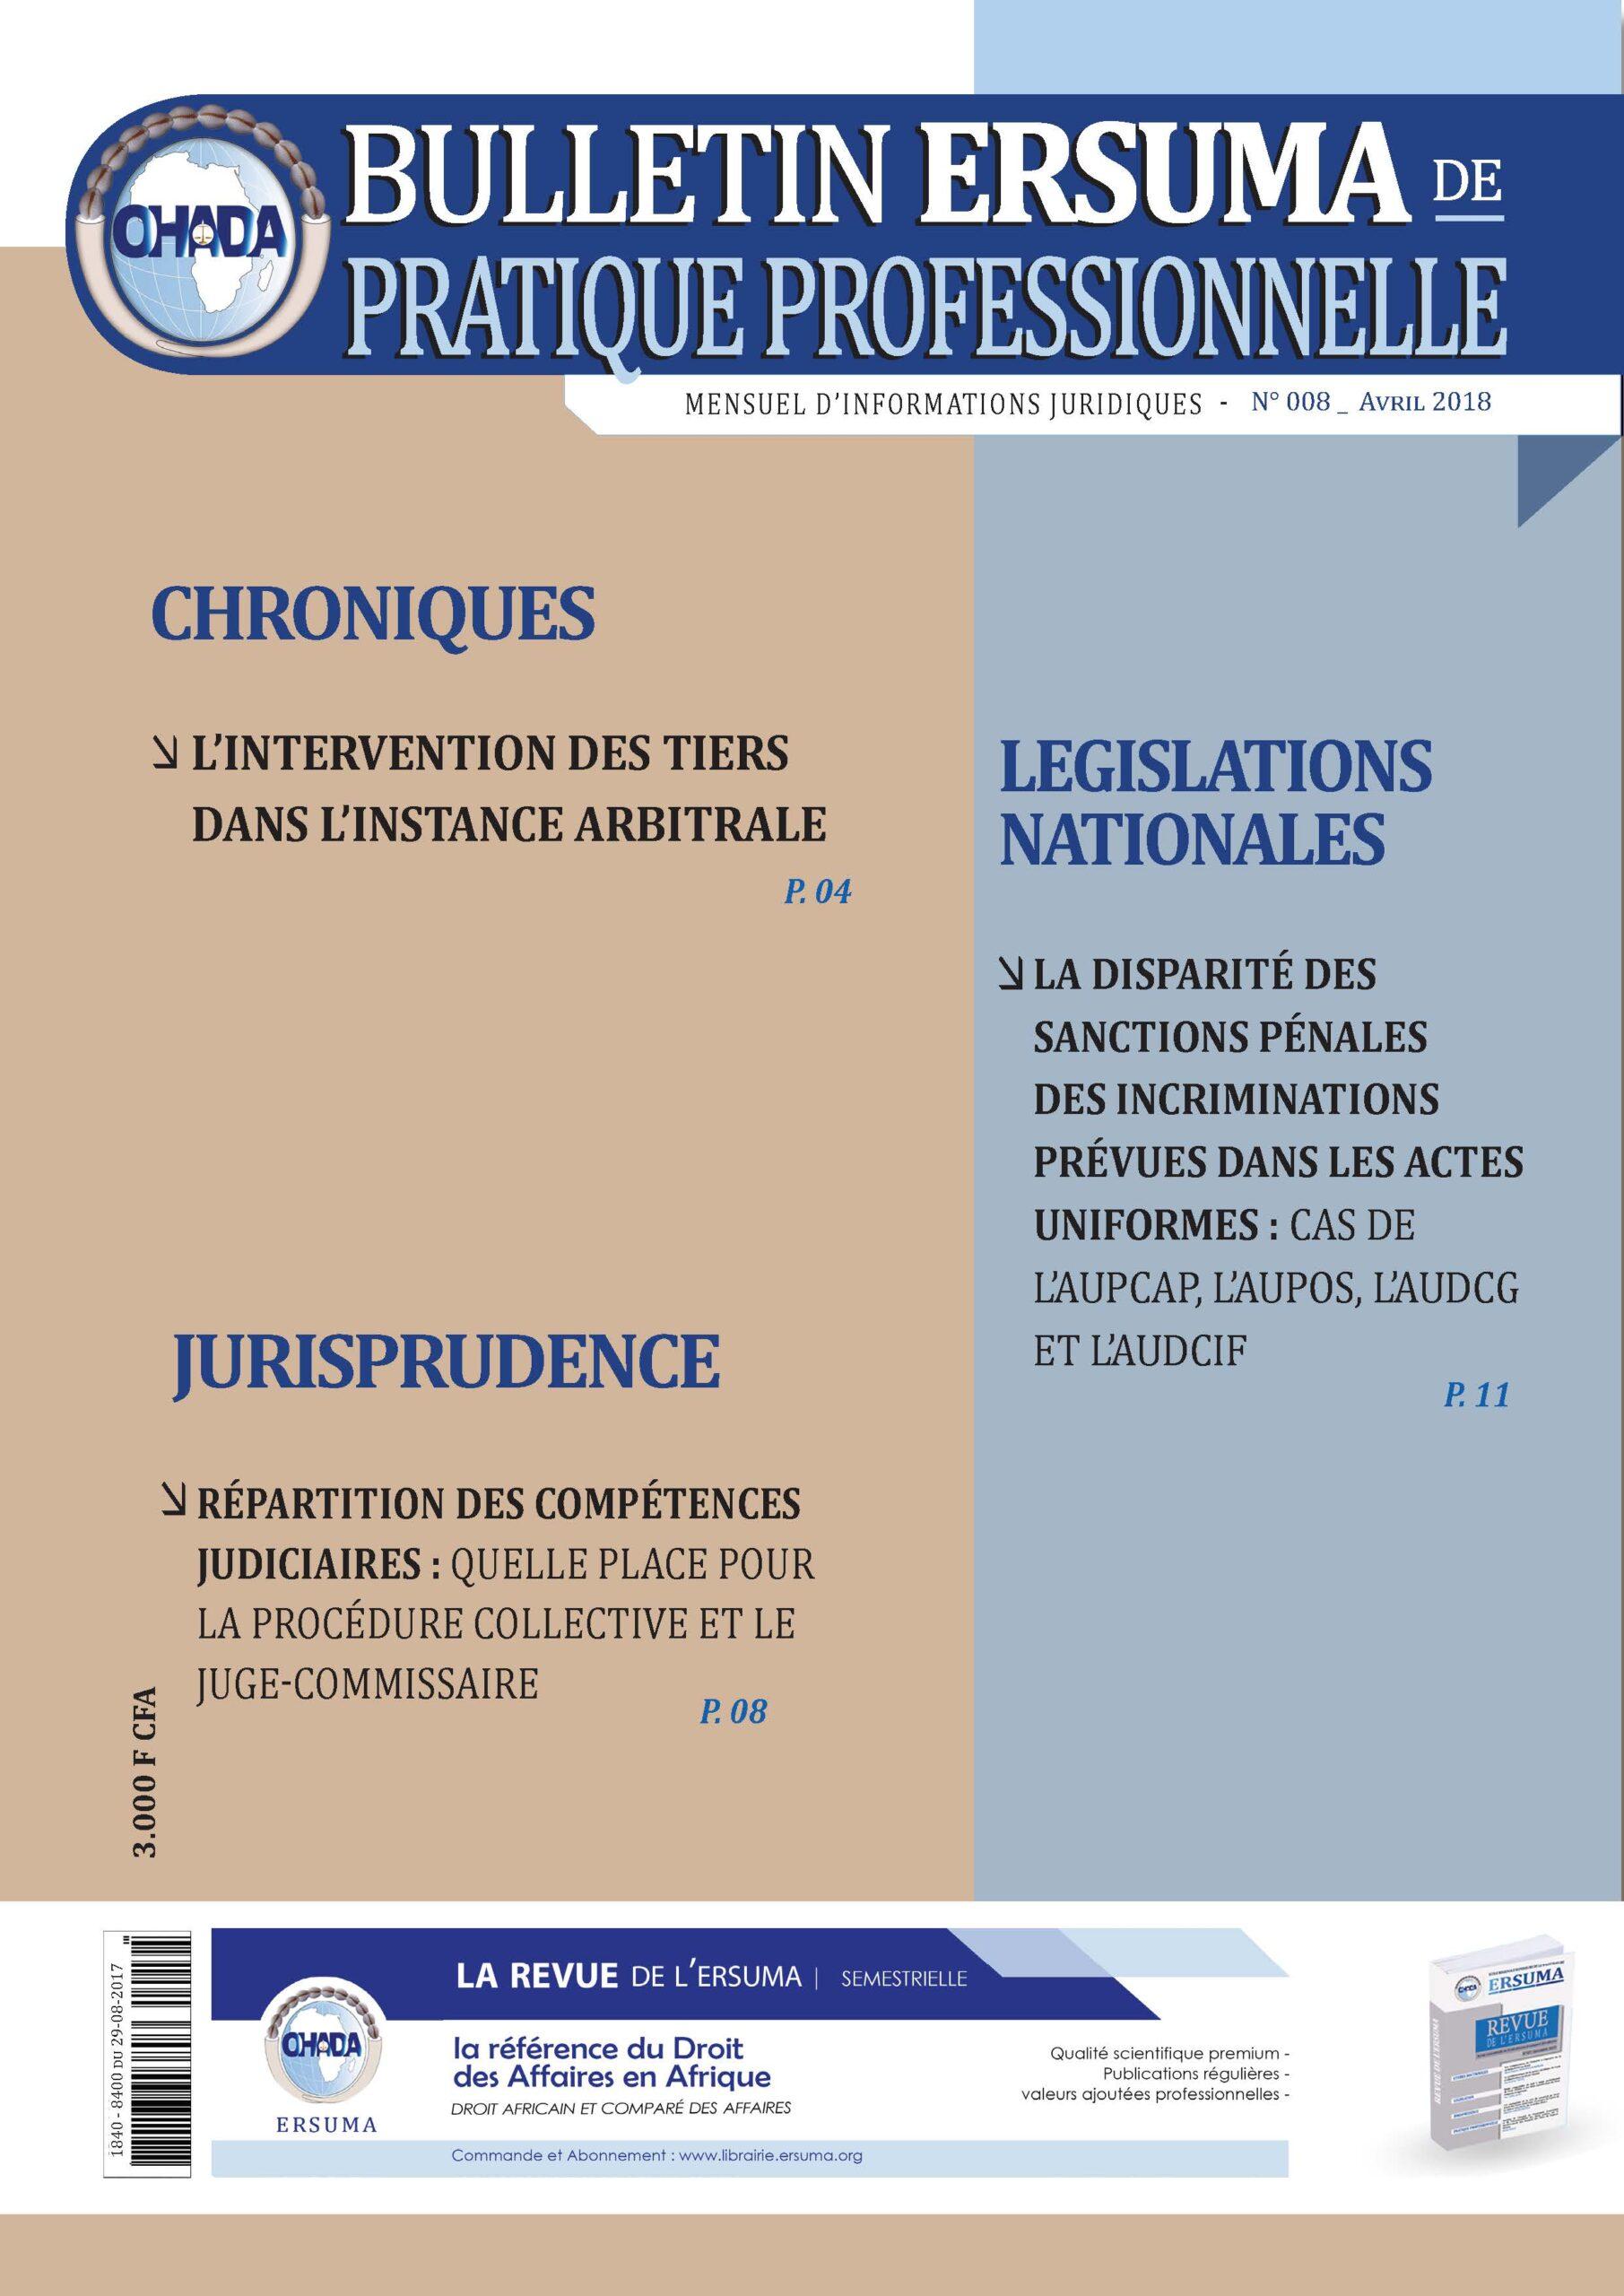 ERSUMA – OHADA / PUBLICATION OF ISSUE No.8 OF THE ERSUMA BULLETIN OF PROFESSIONAL PRACTICE